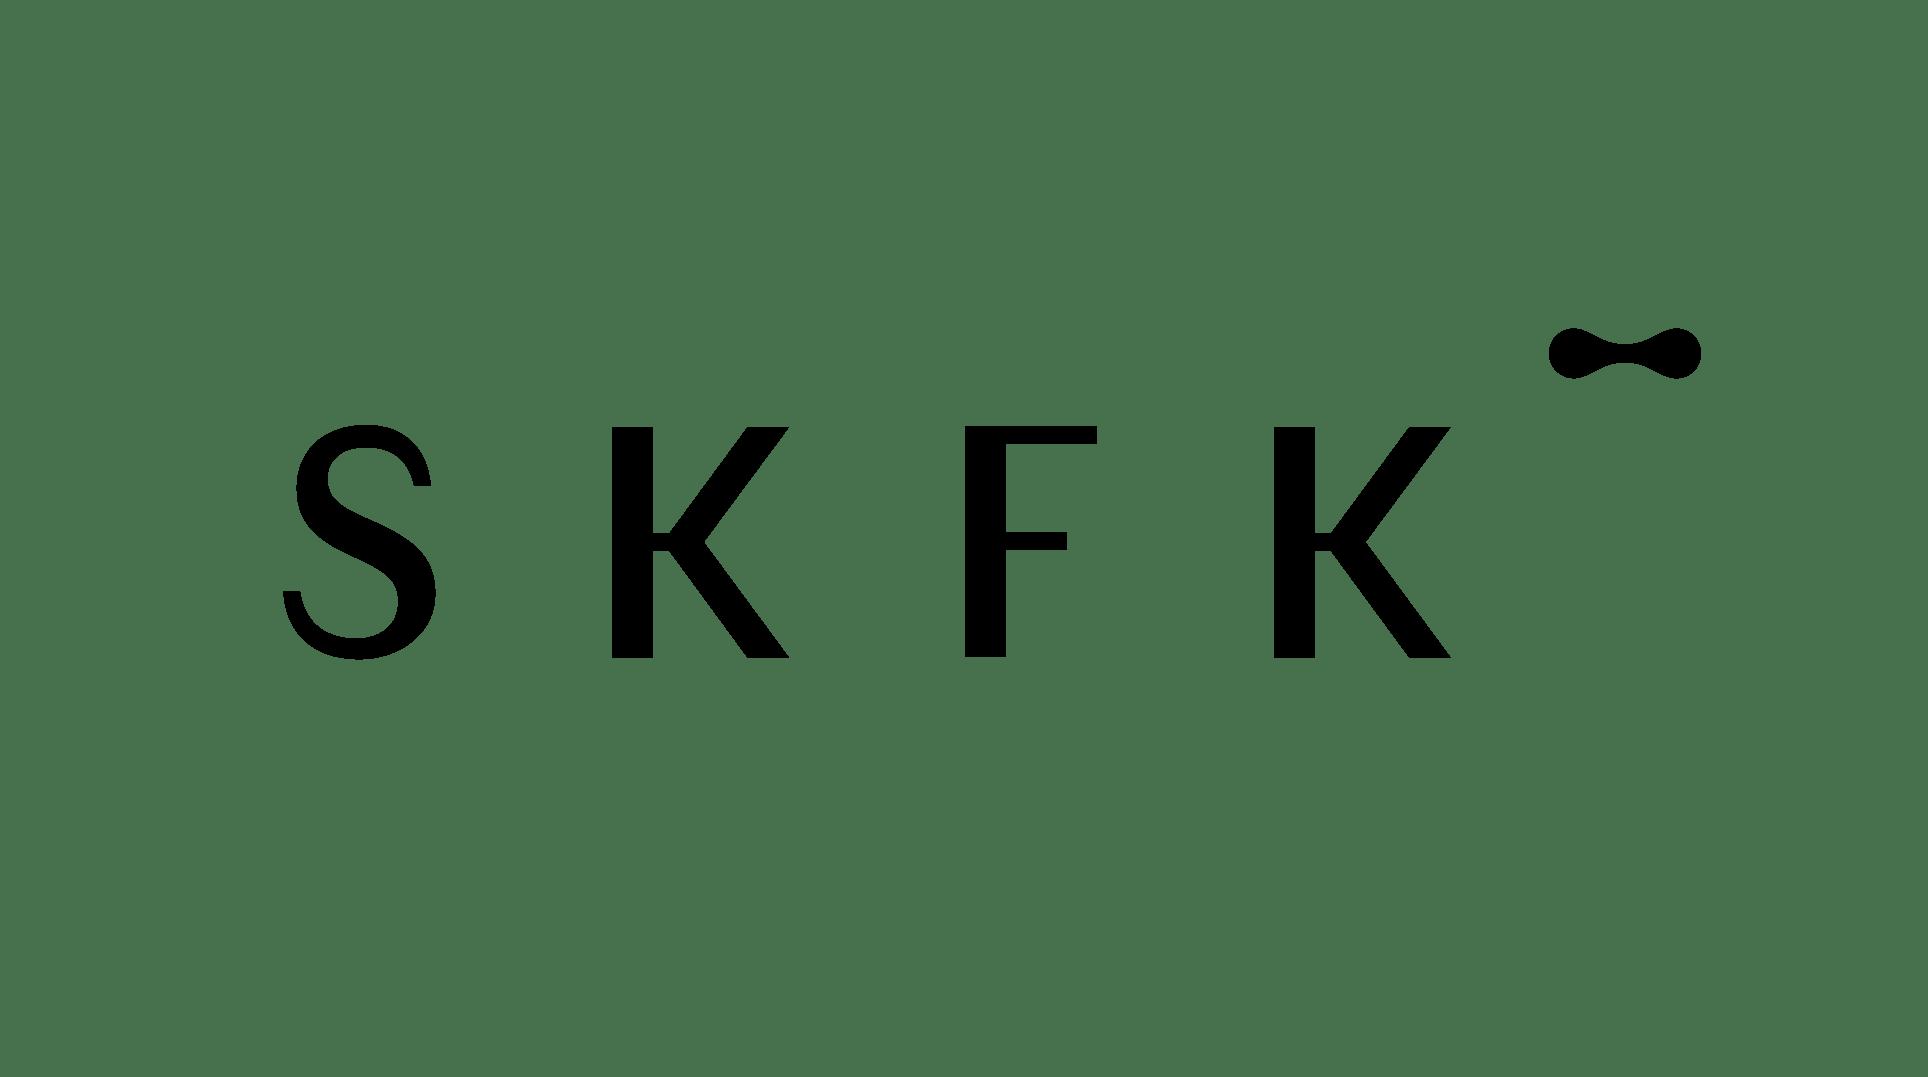 logo skfk